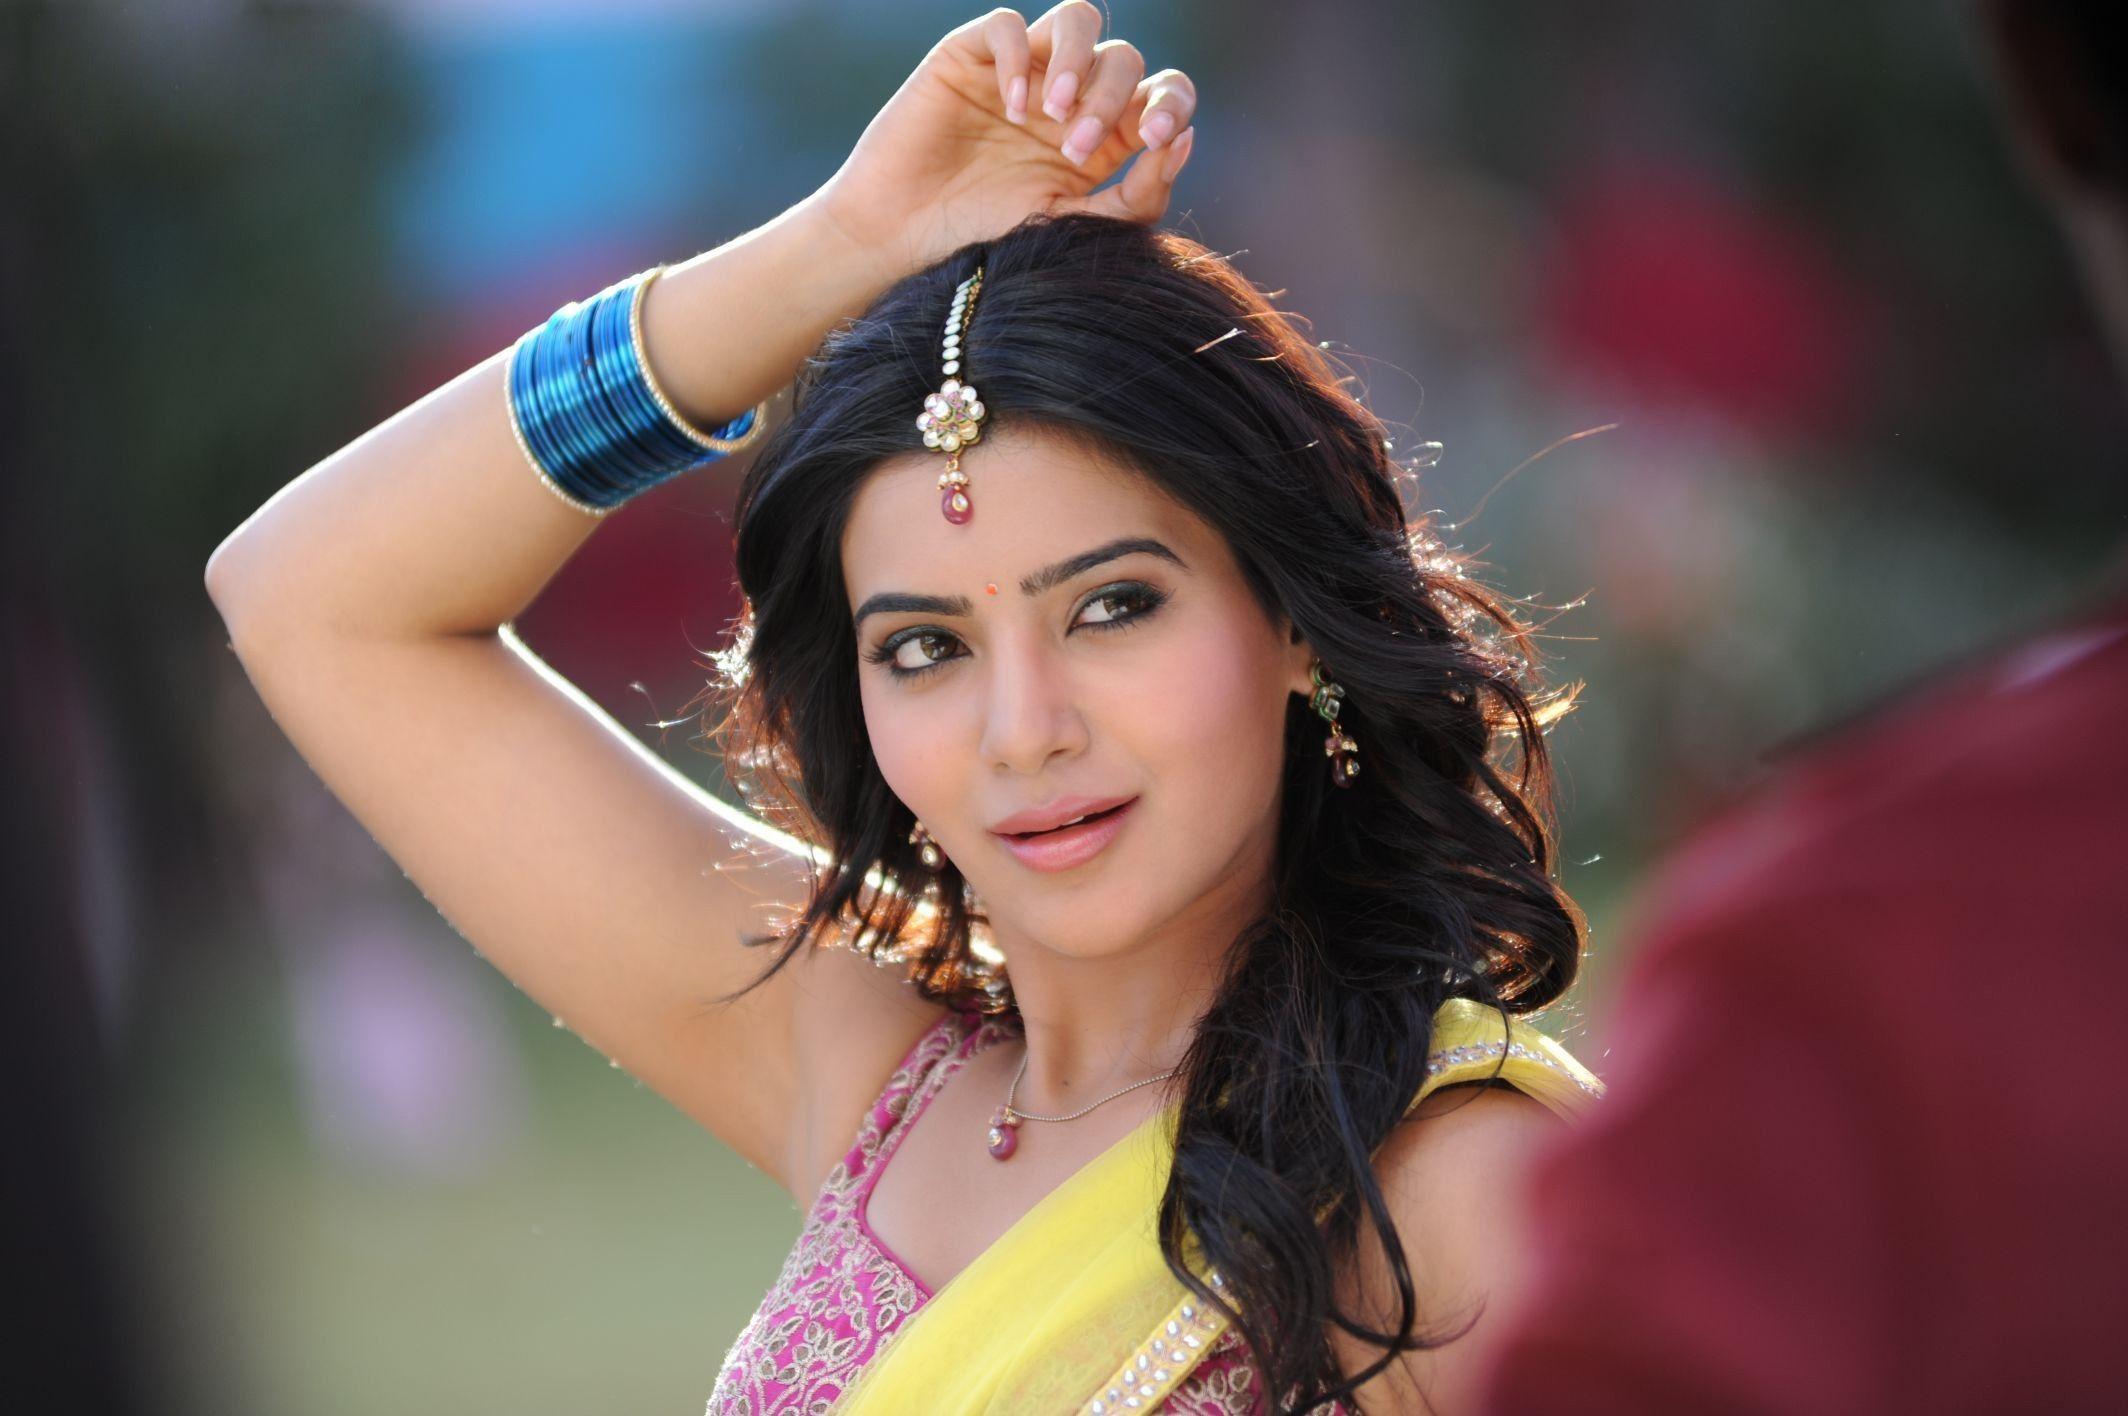 Full HD Wallpapers Bollywood Actress 2128x1416